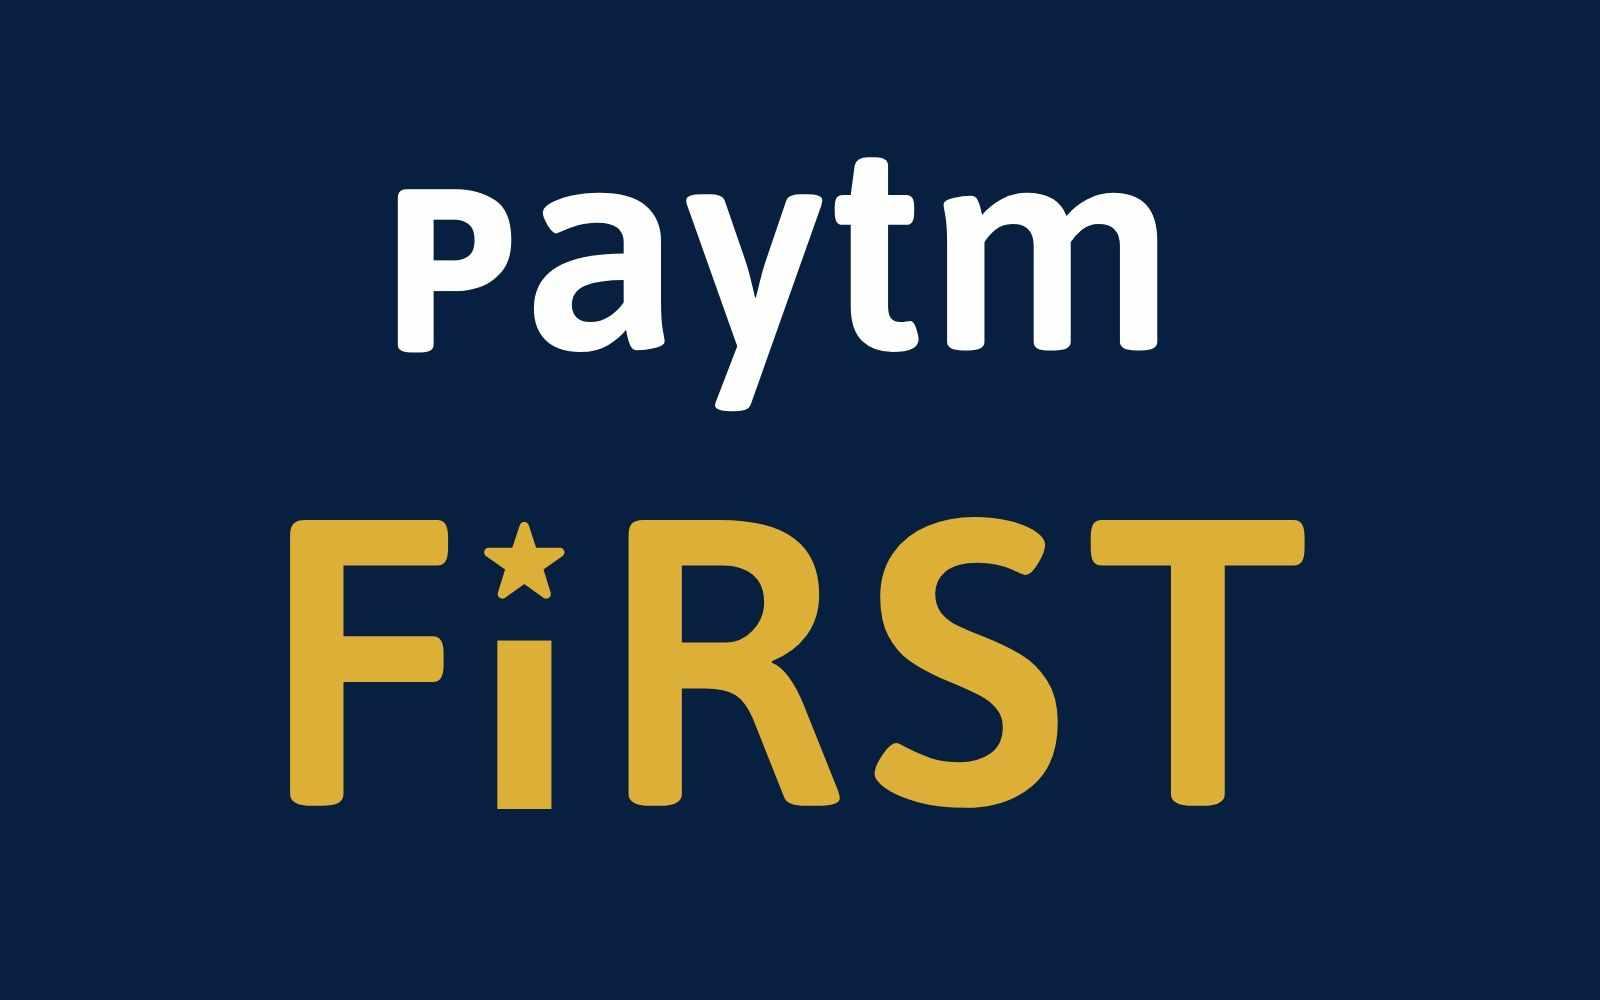 Paytm First Membership